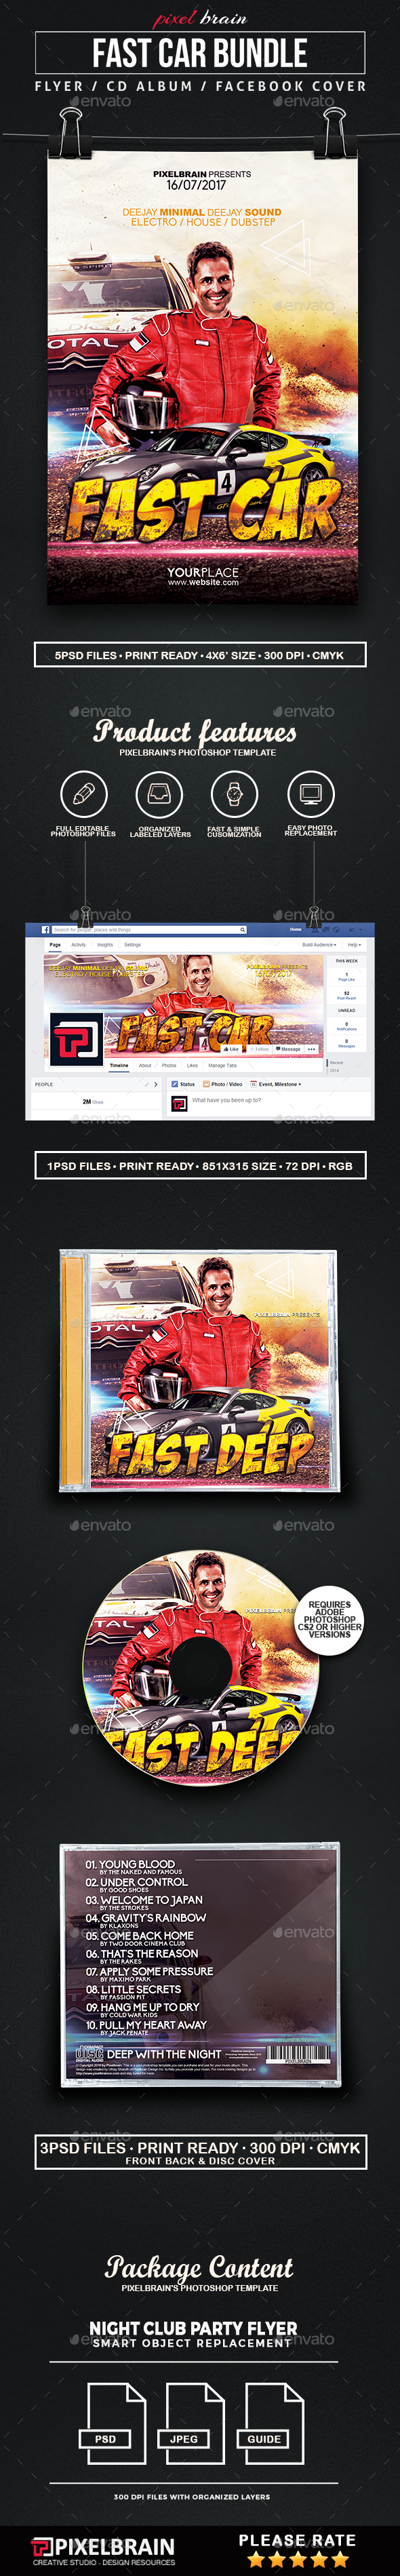 Fast Car Template Bundle - Print Templates